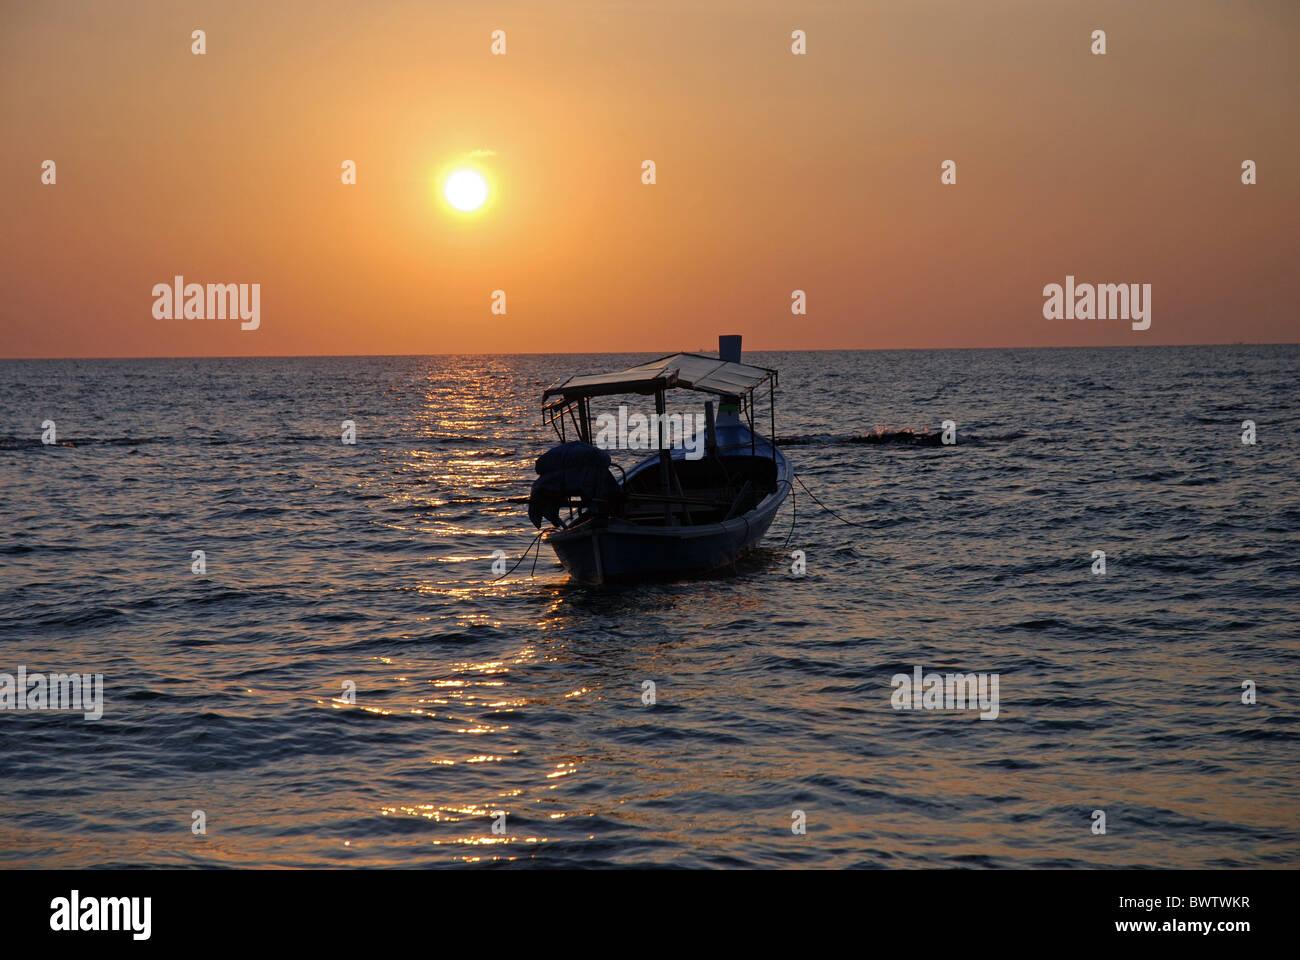 Thailand Asia Evening moody Andamanen sea Asia trip Boat Boats Vacation Holiday Leisure Recreatioin Khao - Stock Image